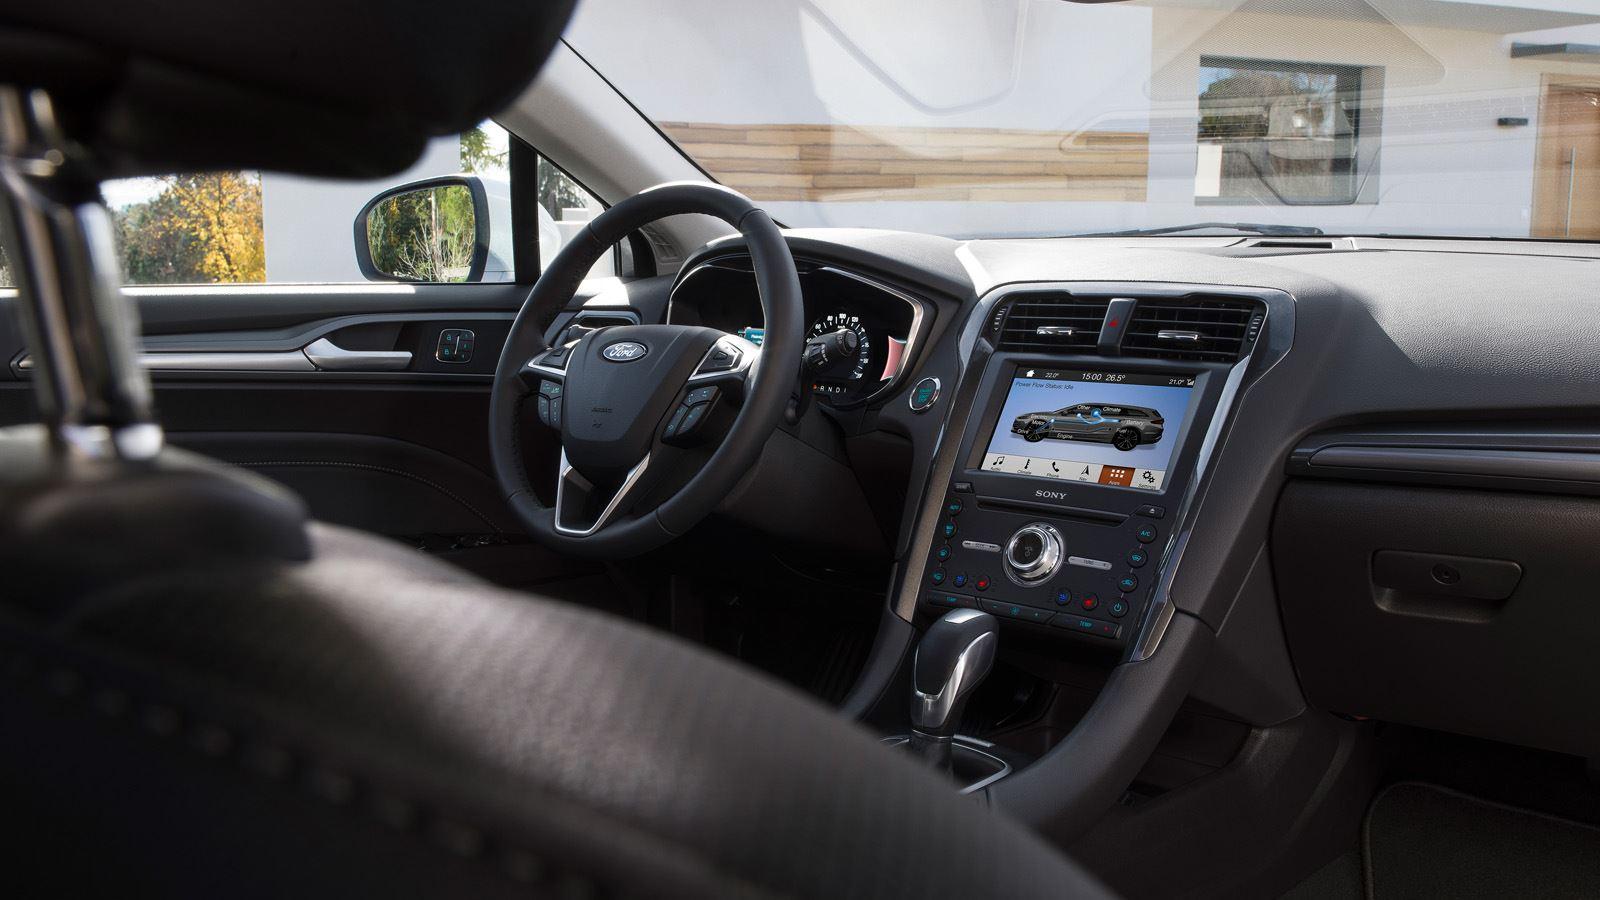 Ford Mondeo Hybrid Wagon interieurfoto2 1600x900px